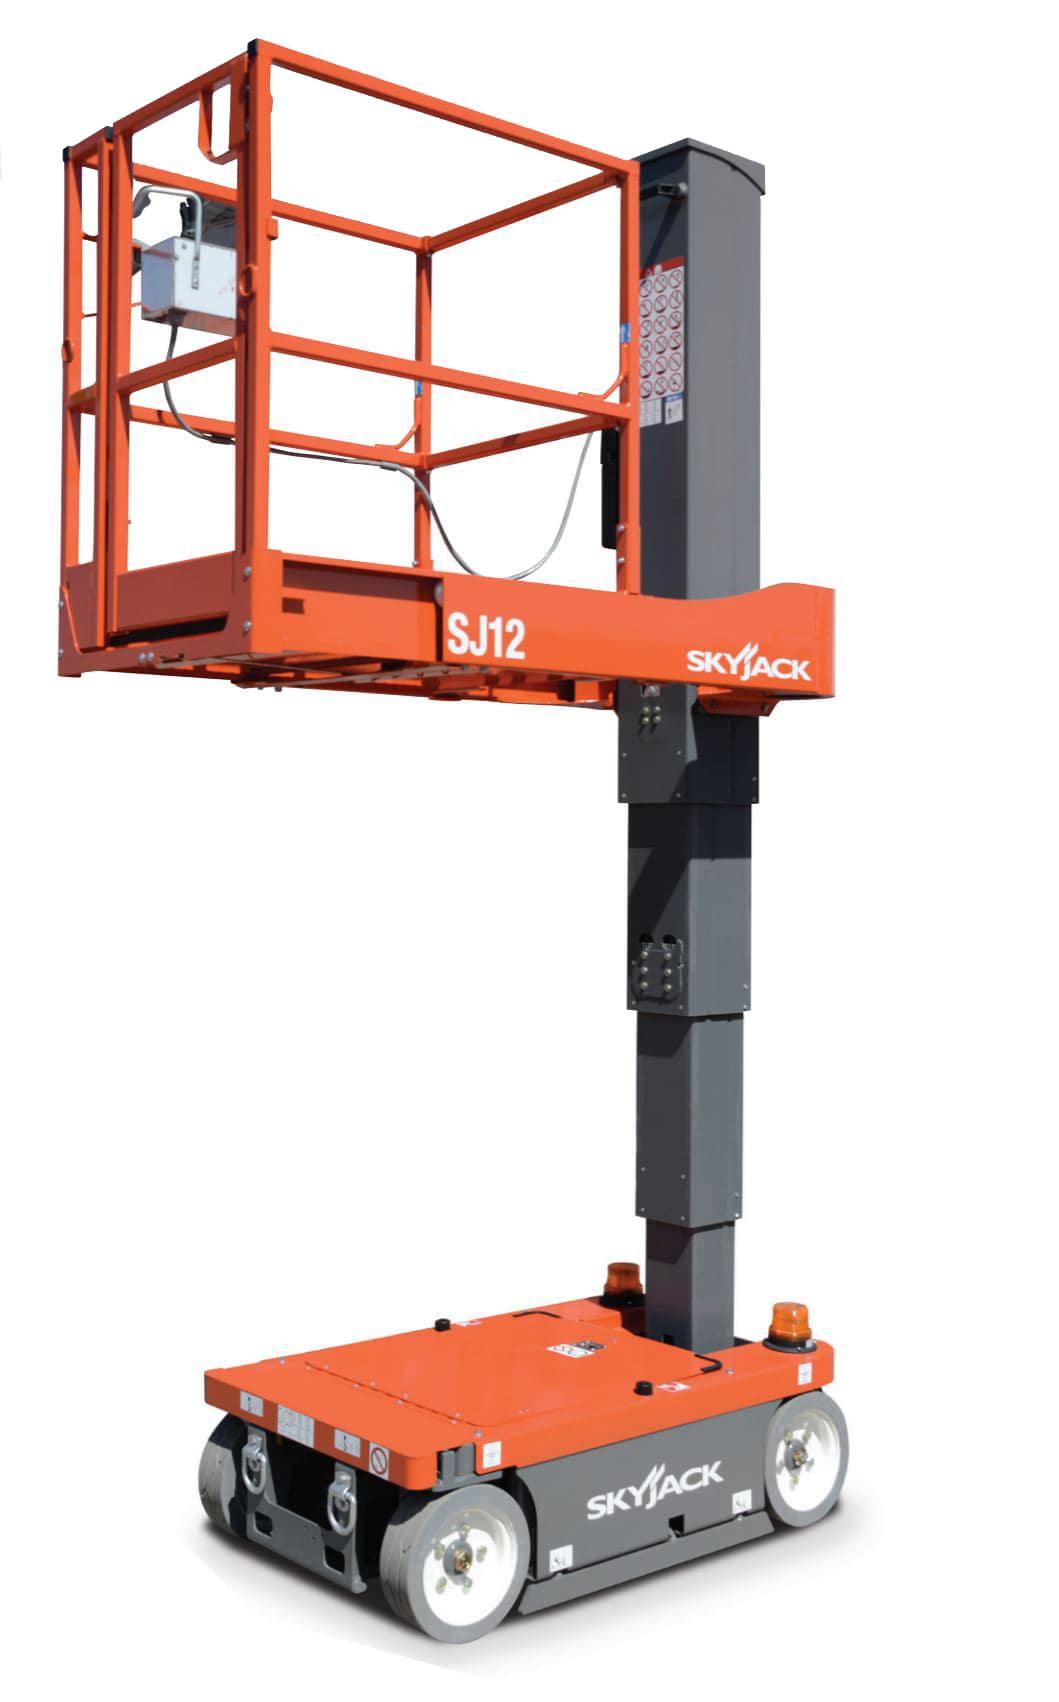 Skyjack Sj12 5.6m Mast Lift 227kg Capacity